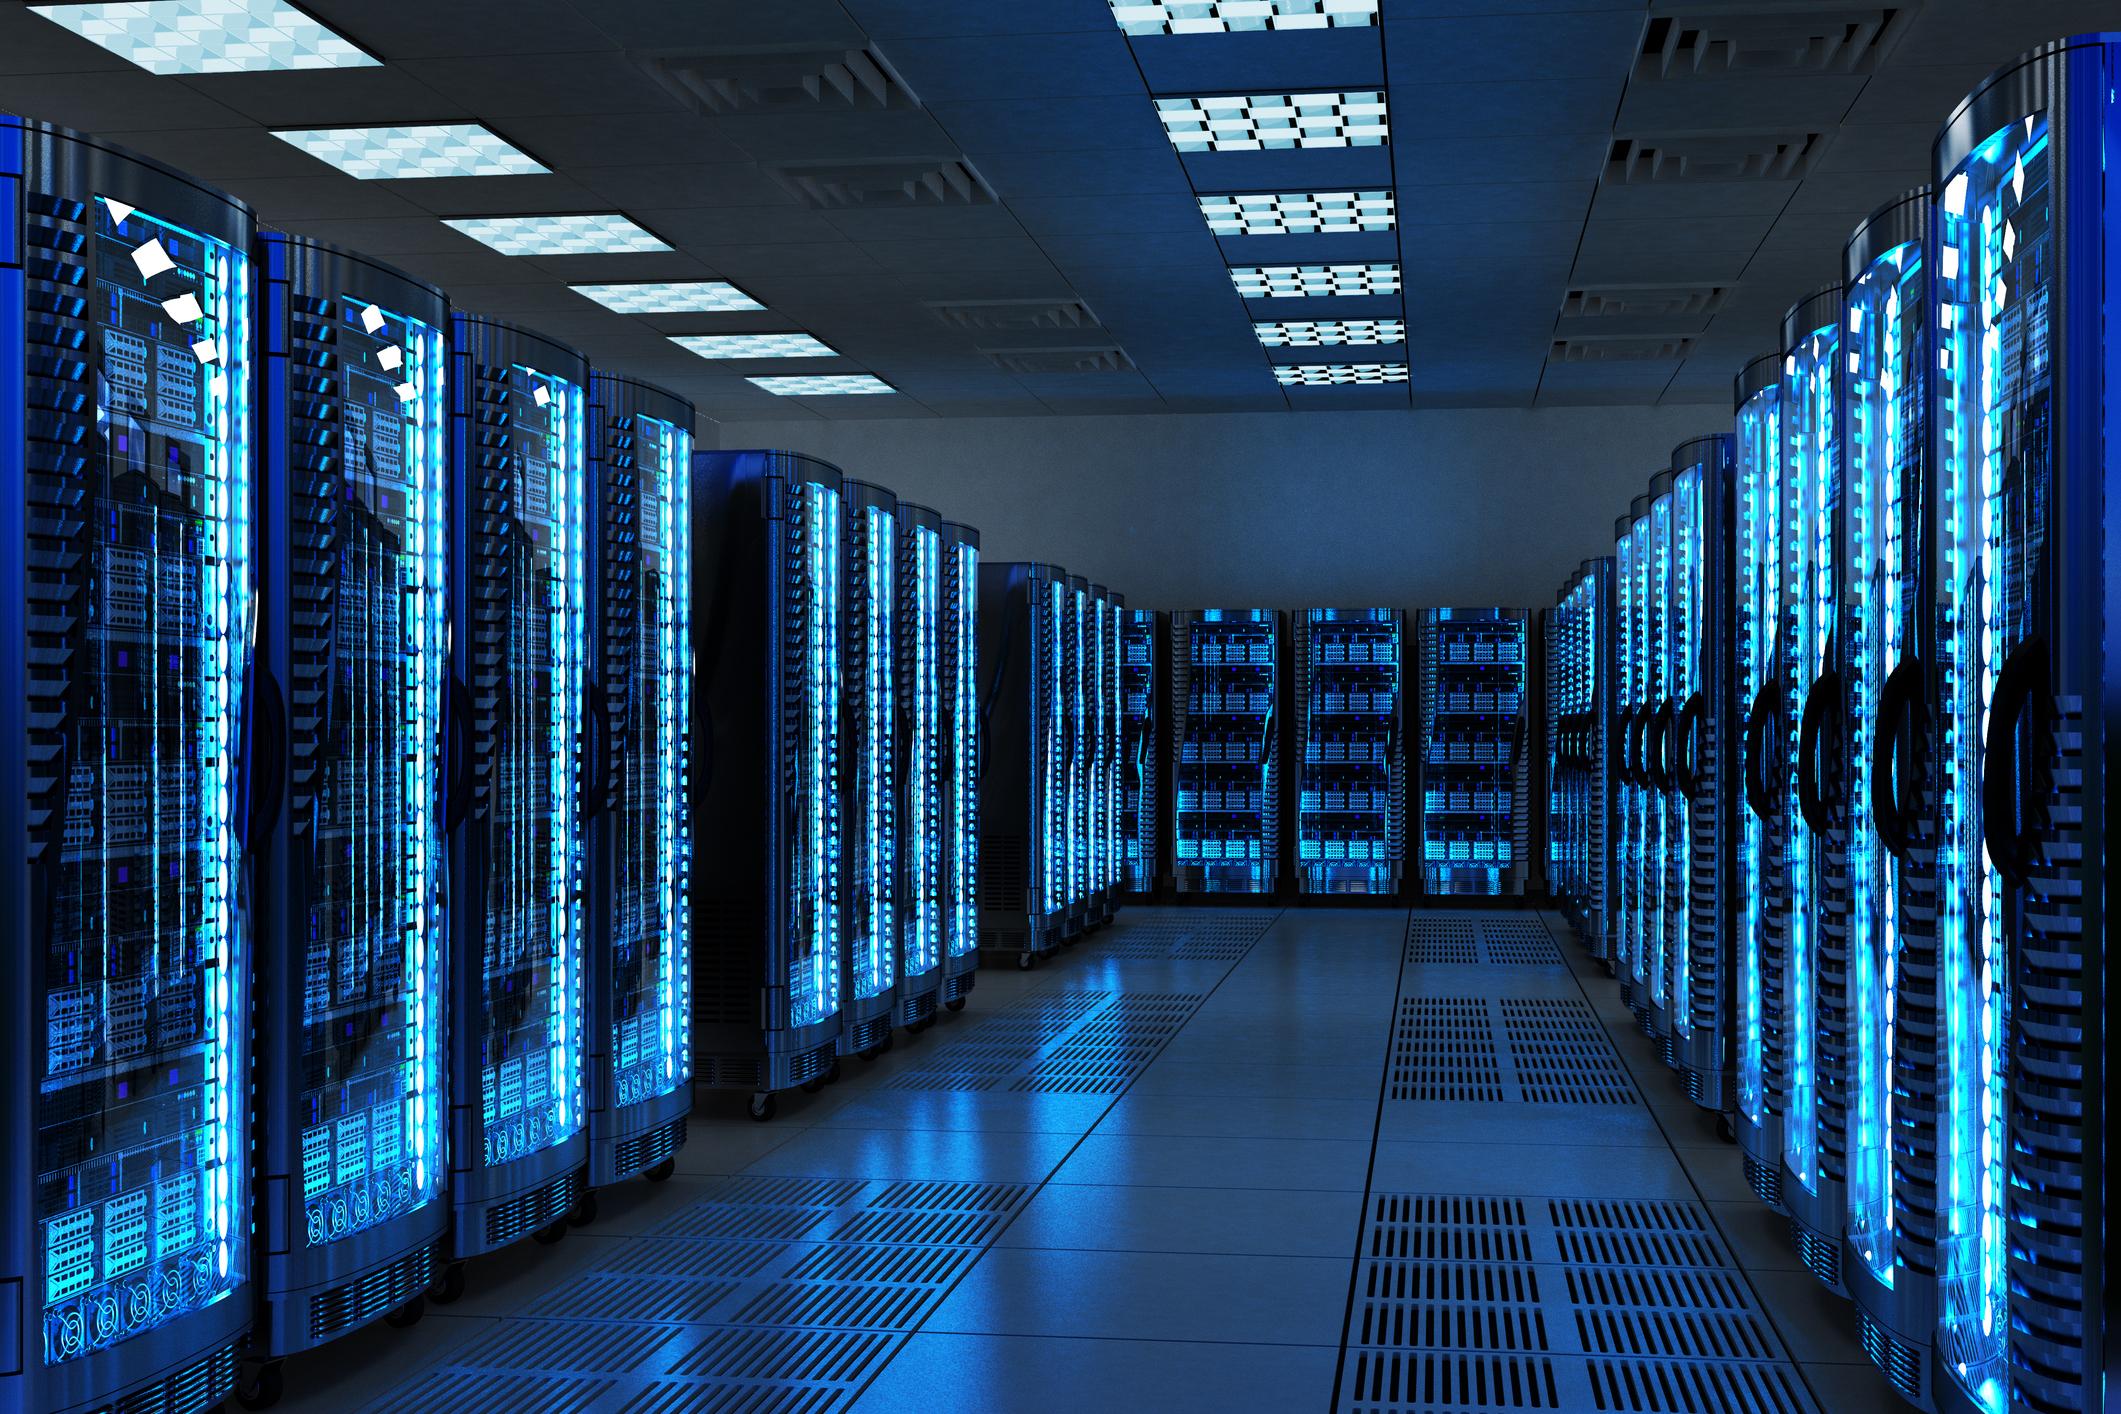 Interior of a data center showing racks of equipment.